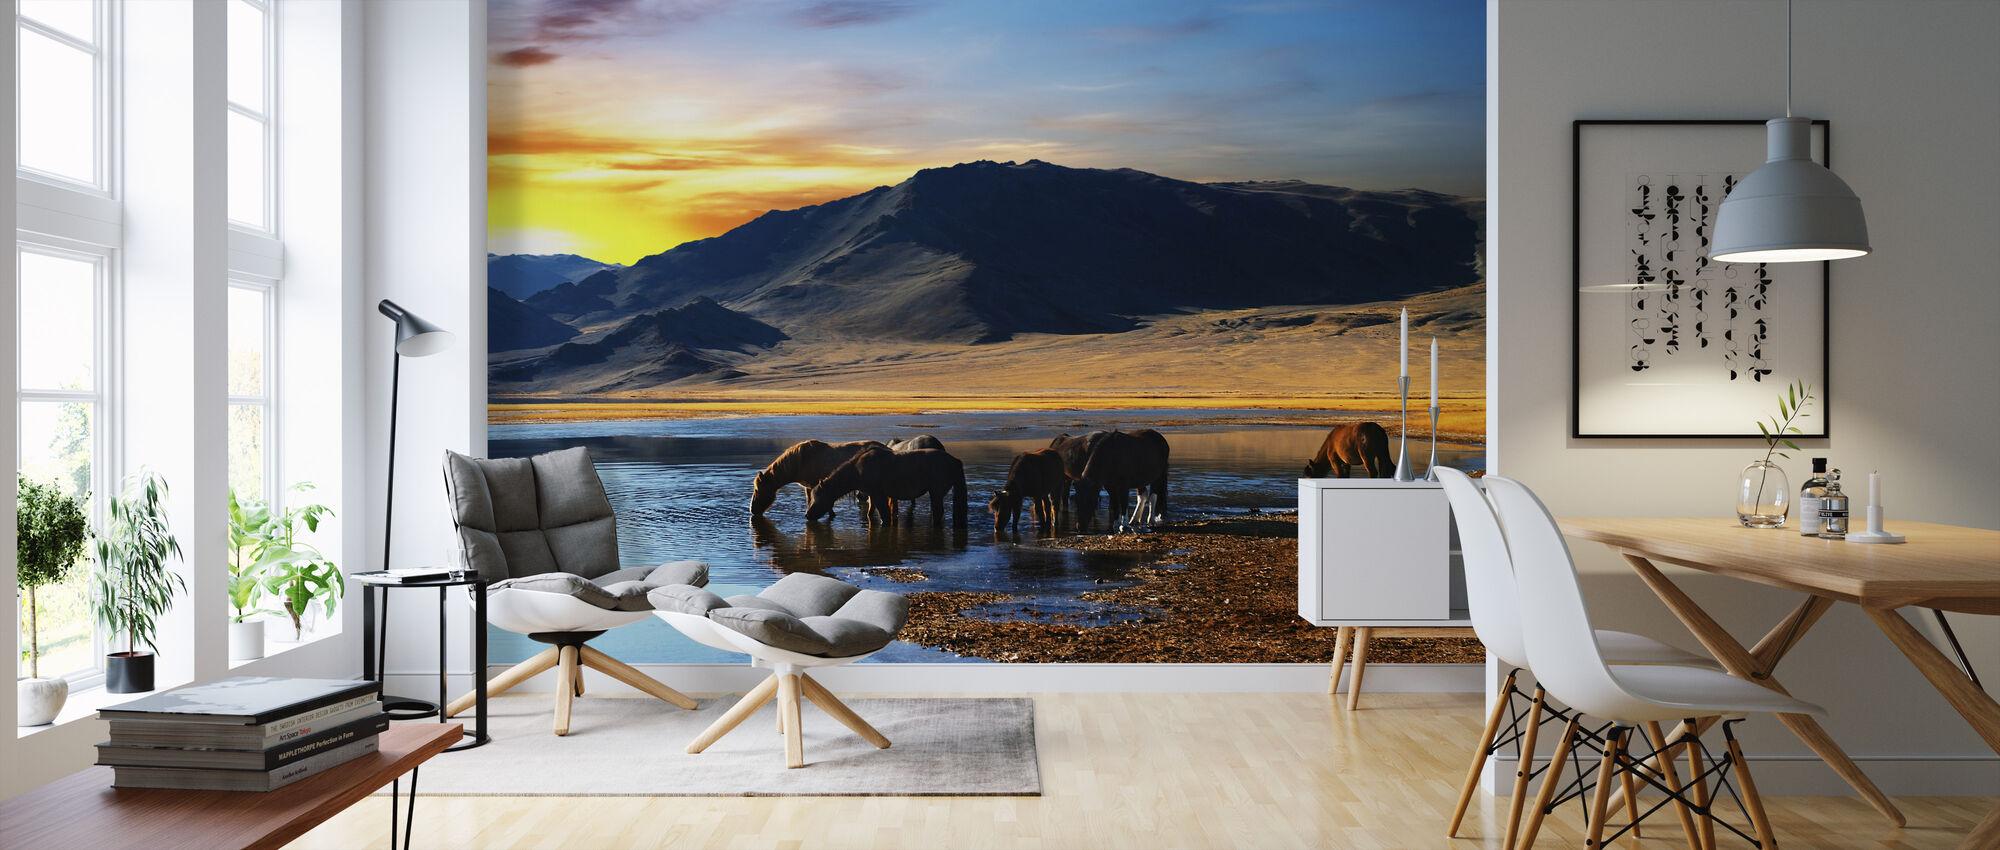 drinking horses fototapete nach ma photowall. Black Bedroom Furniture Sets. Home Design Ideas